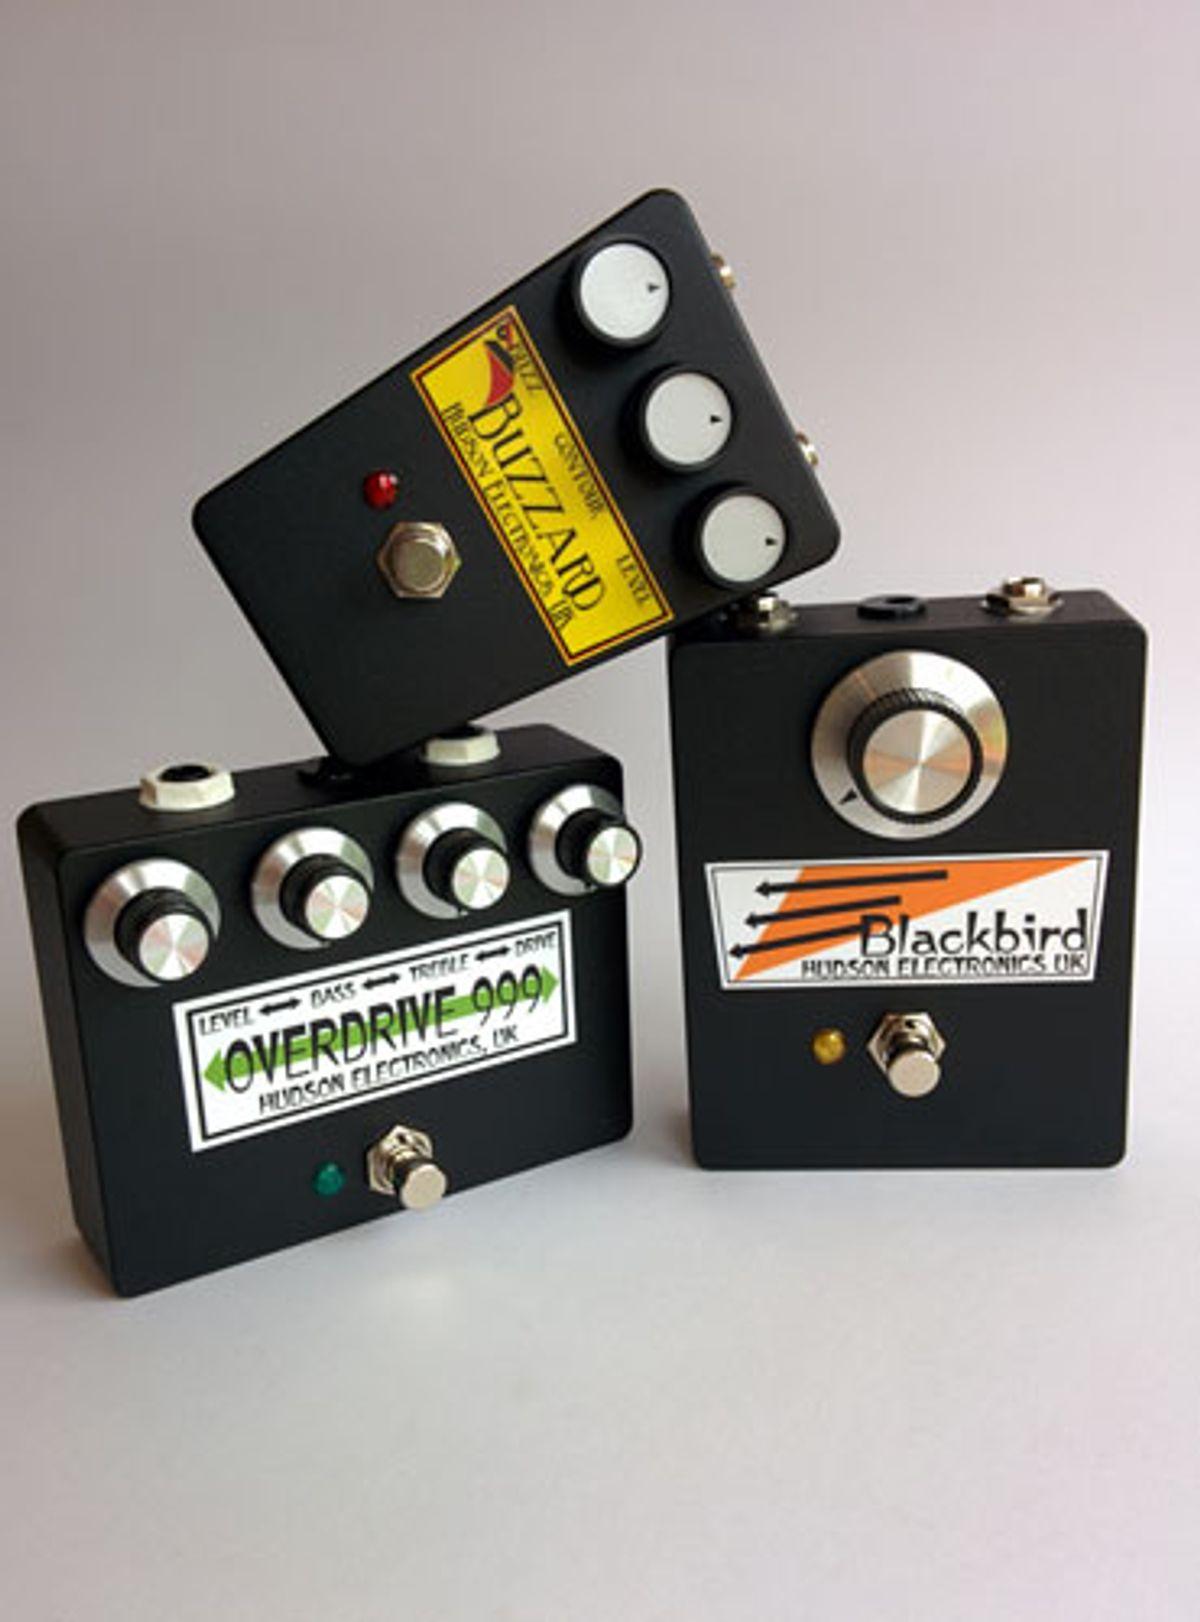 Hudson Electronics Unveils the Overdrive 999, Blackbird, and Buzzard